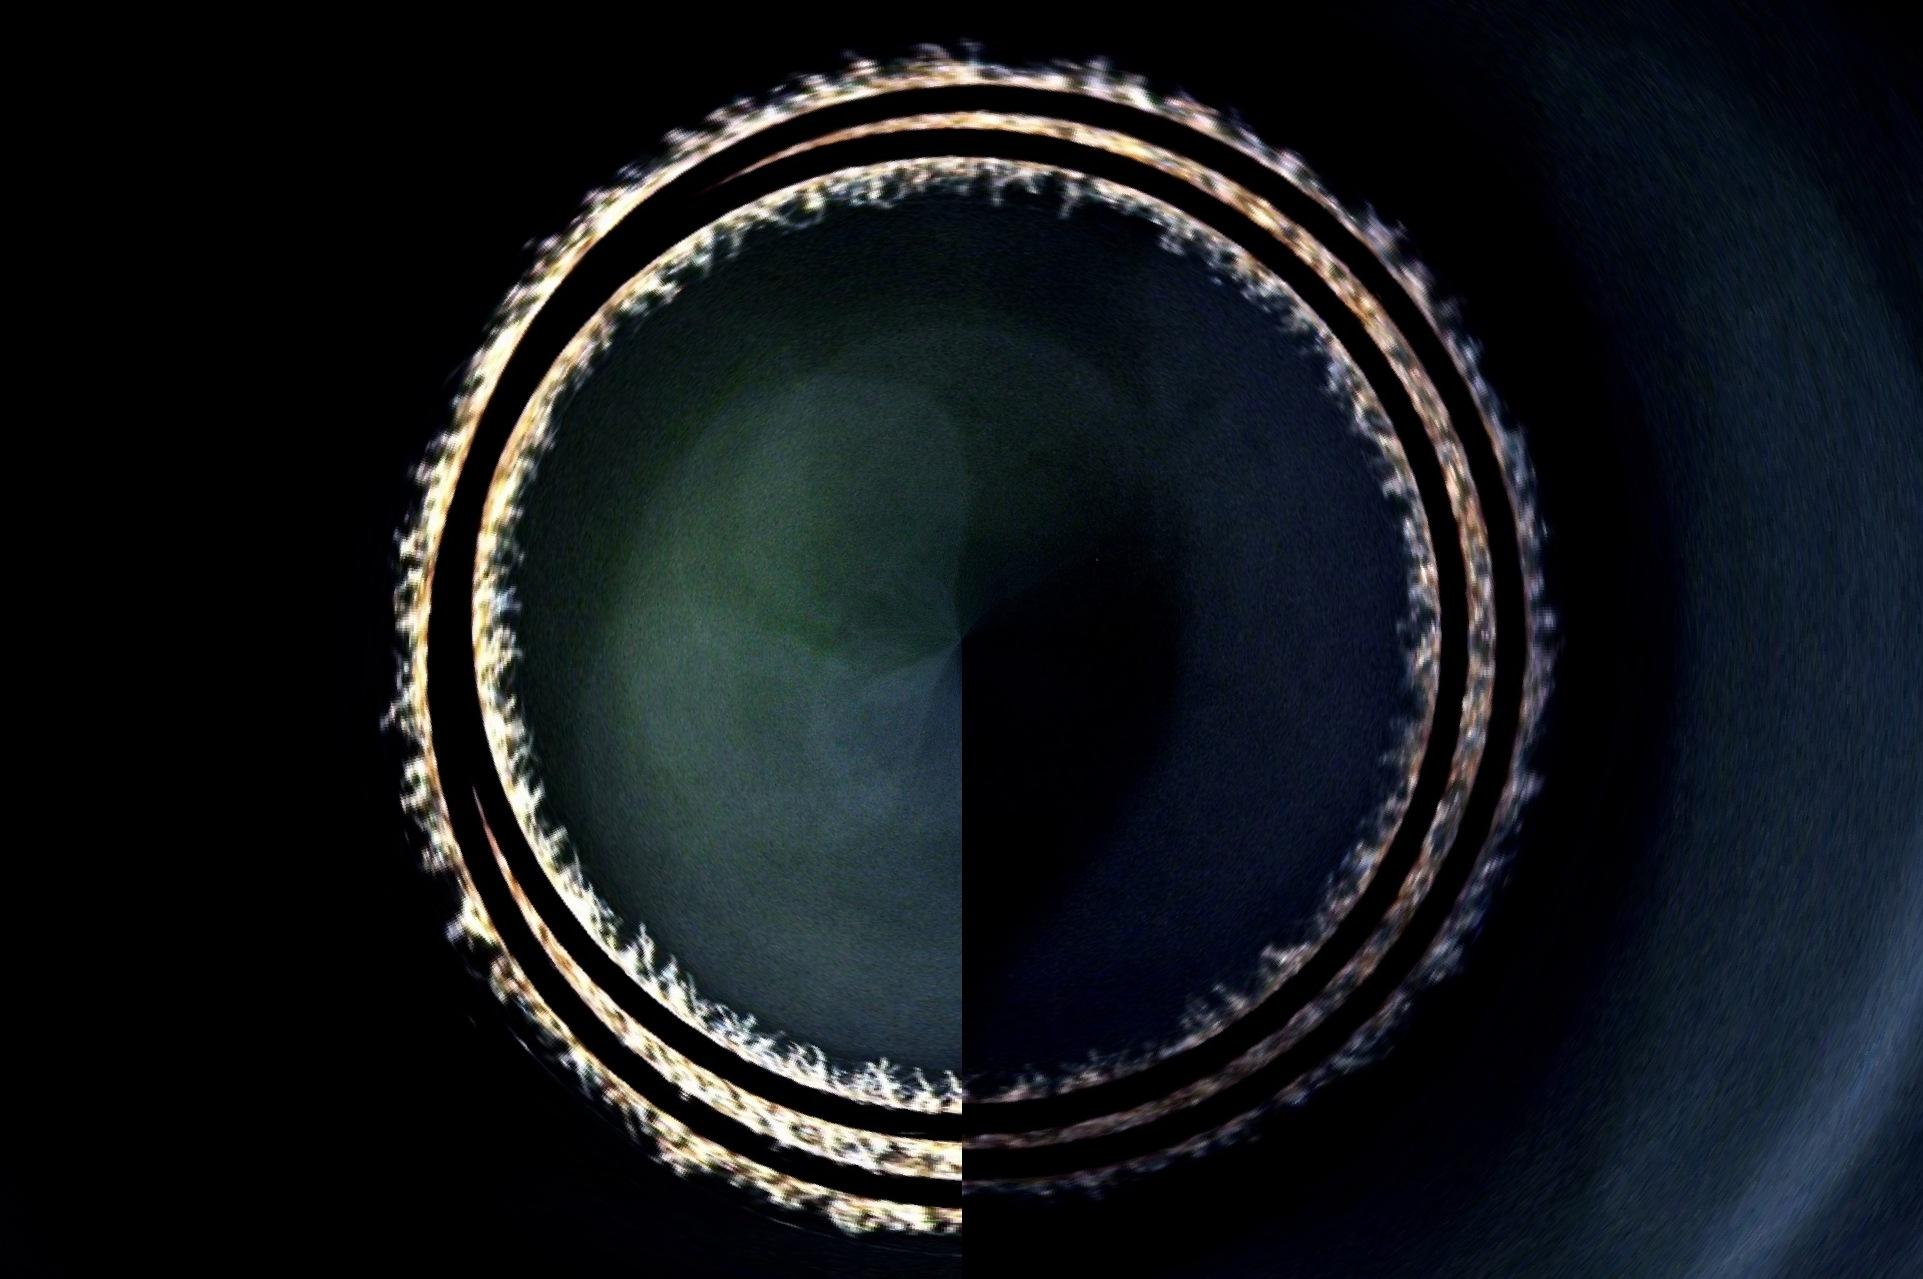 Círculos de Fogo by José Evaldo Suassuna de Oliveira